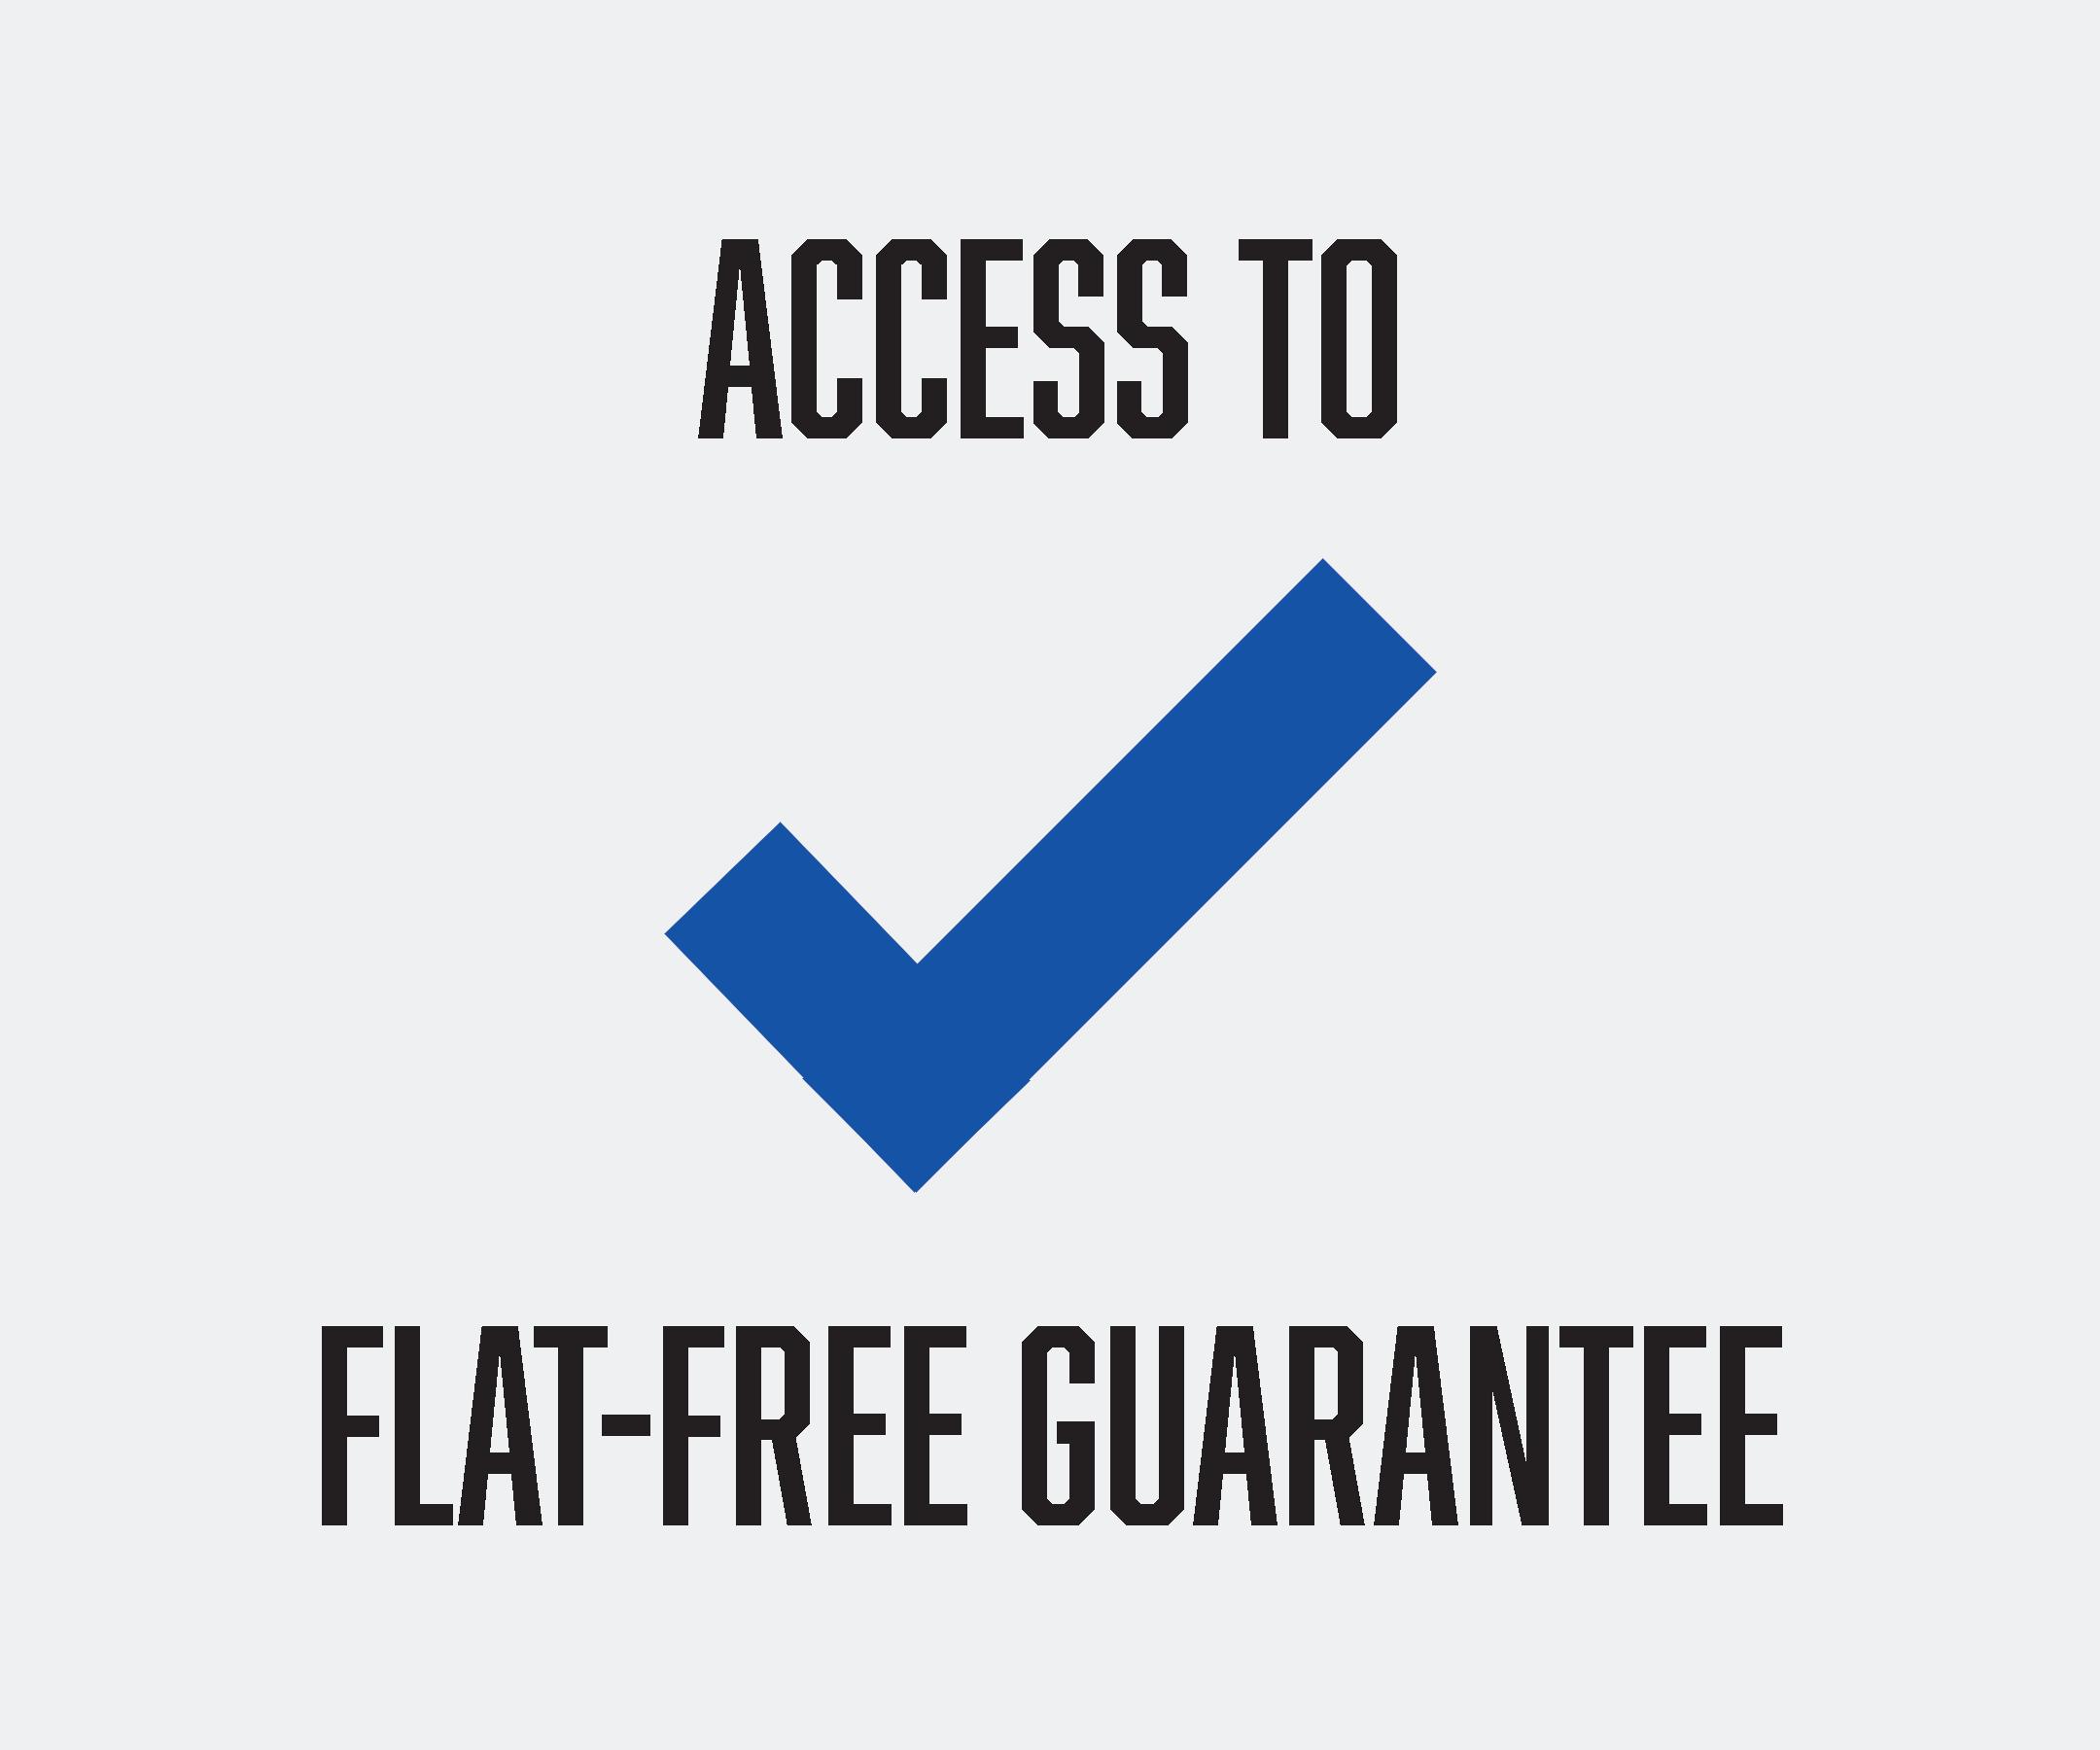 flat free guarantee